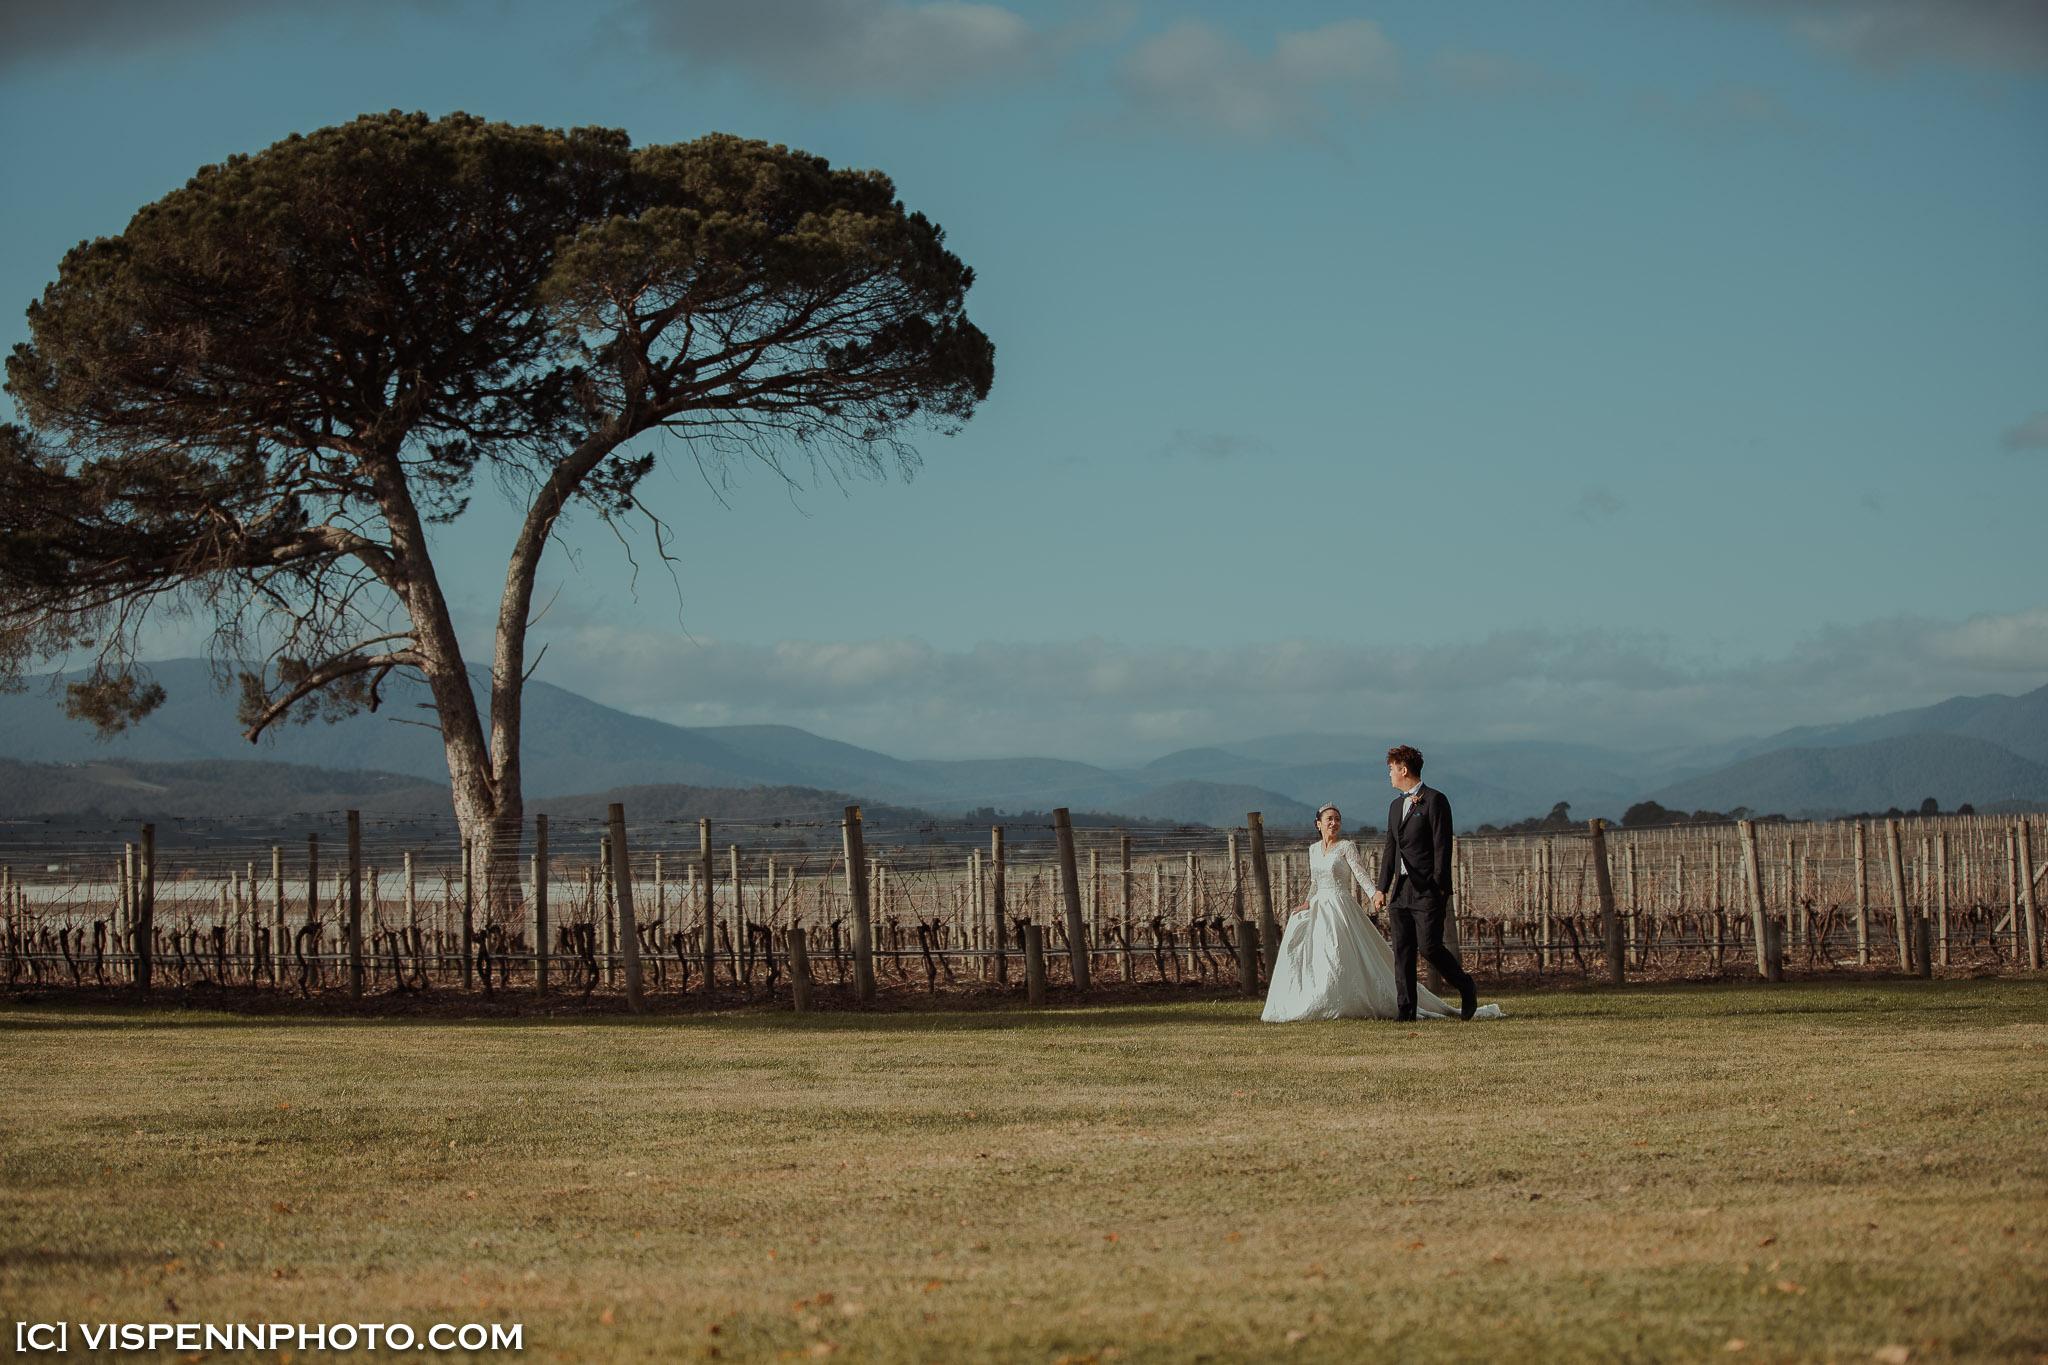 WEDDING DAY Photography Melbourne CoreyCoco 3P 07654 1DX ZHPENN